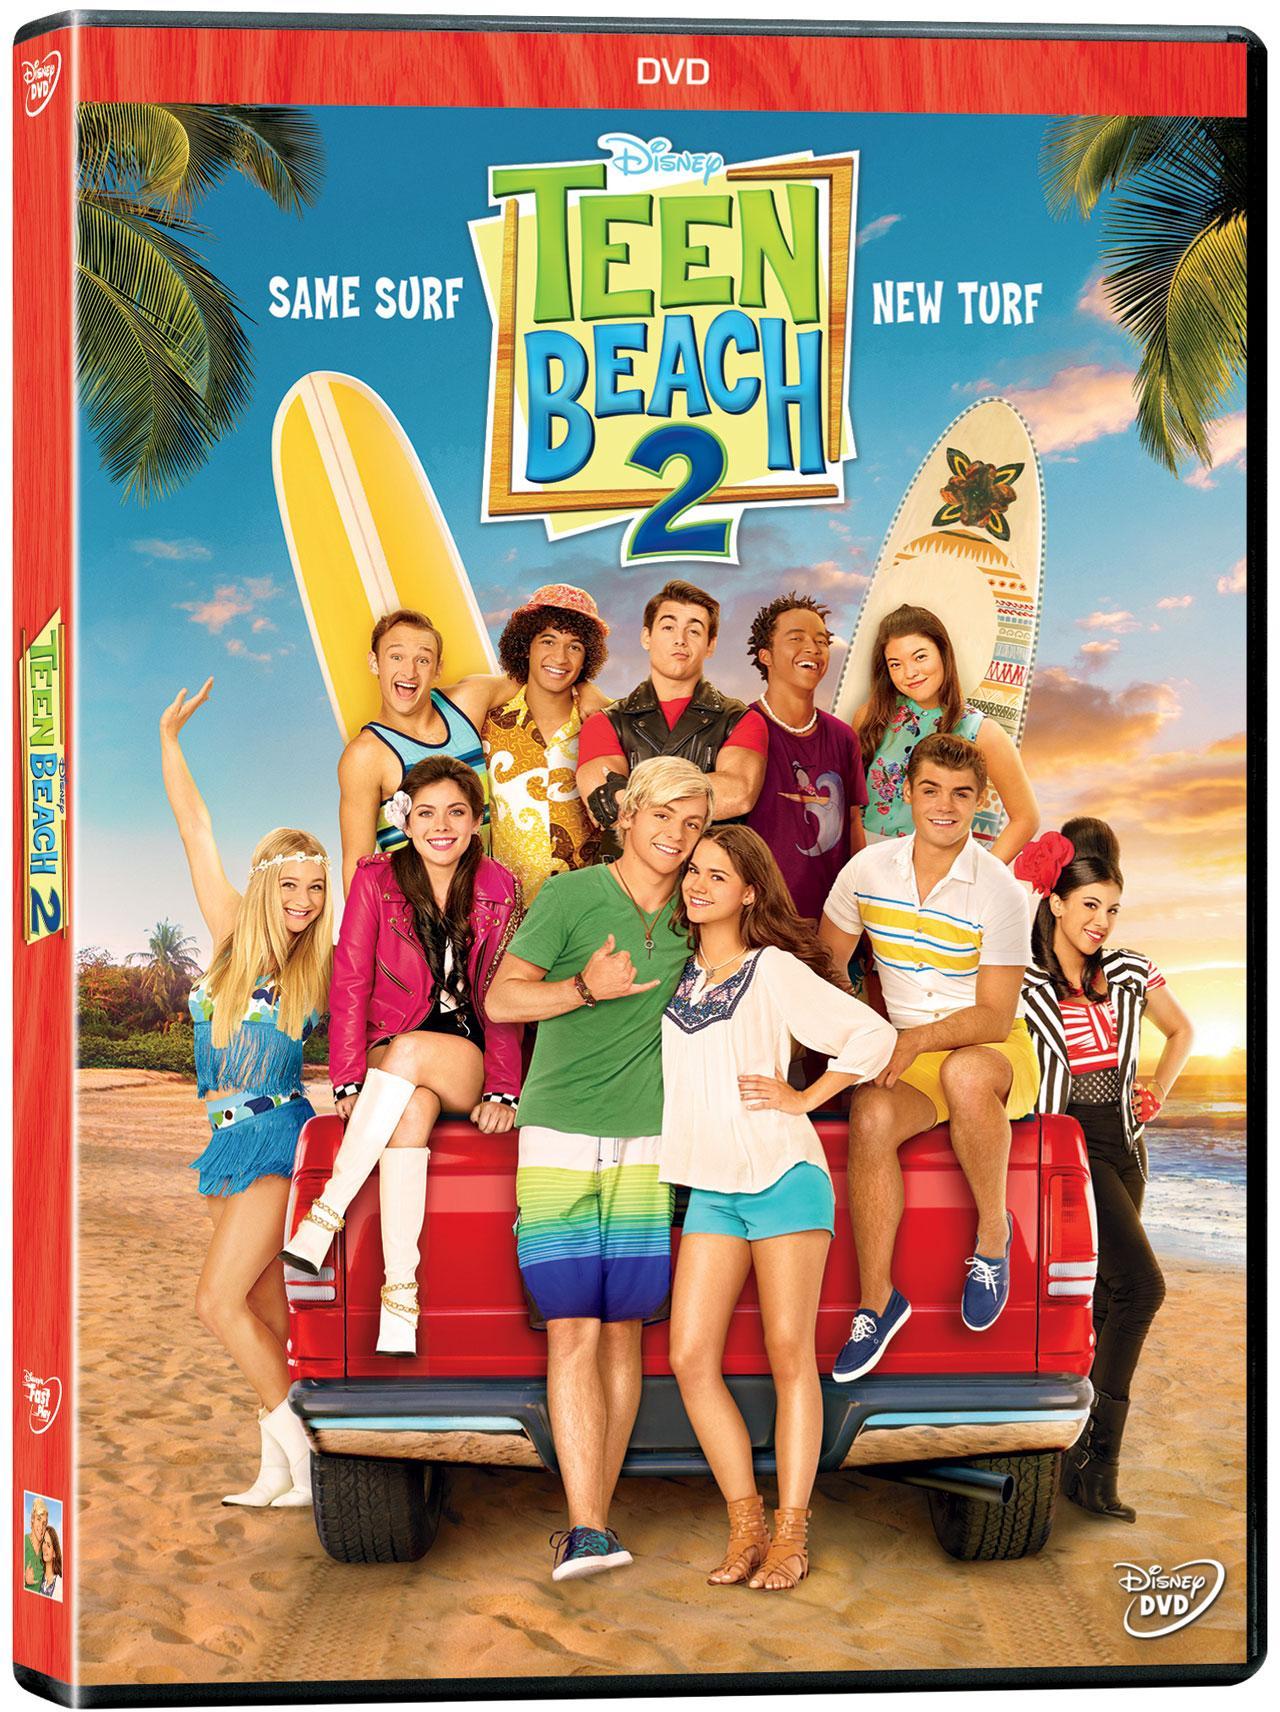 Teen Beach Movie 2 : หาดสวรรค์ วันฝัน วัยใส 2